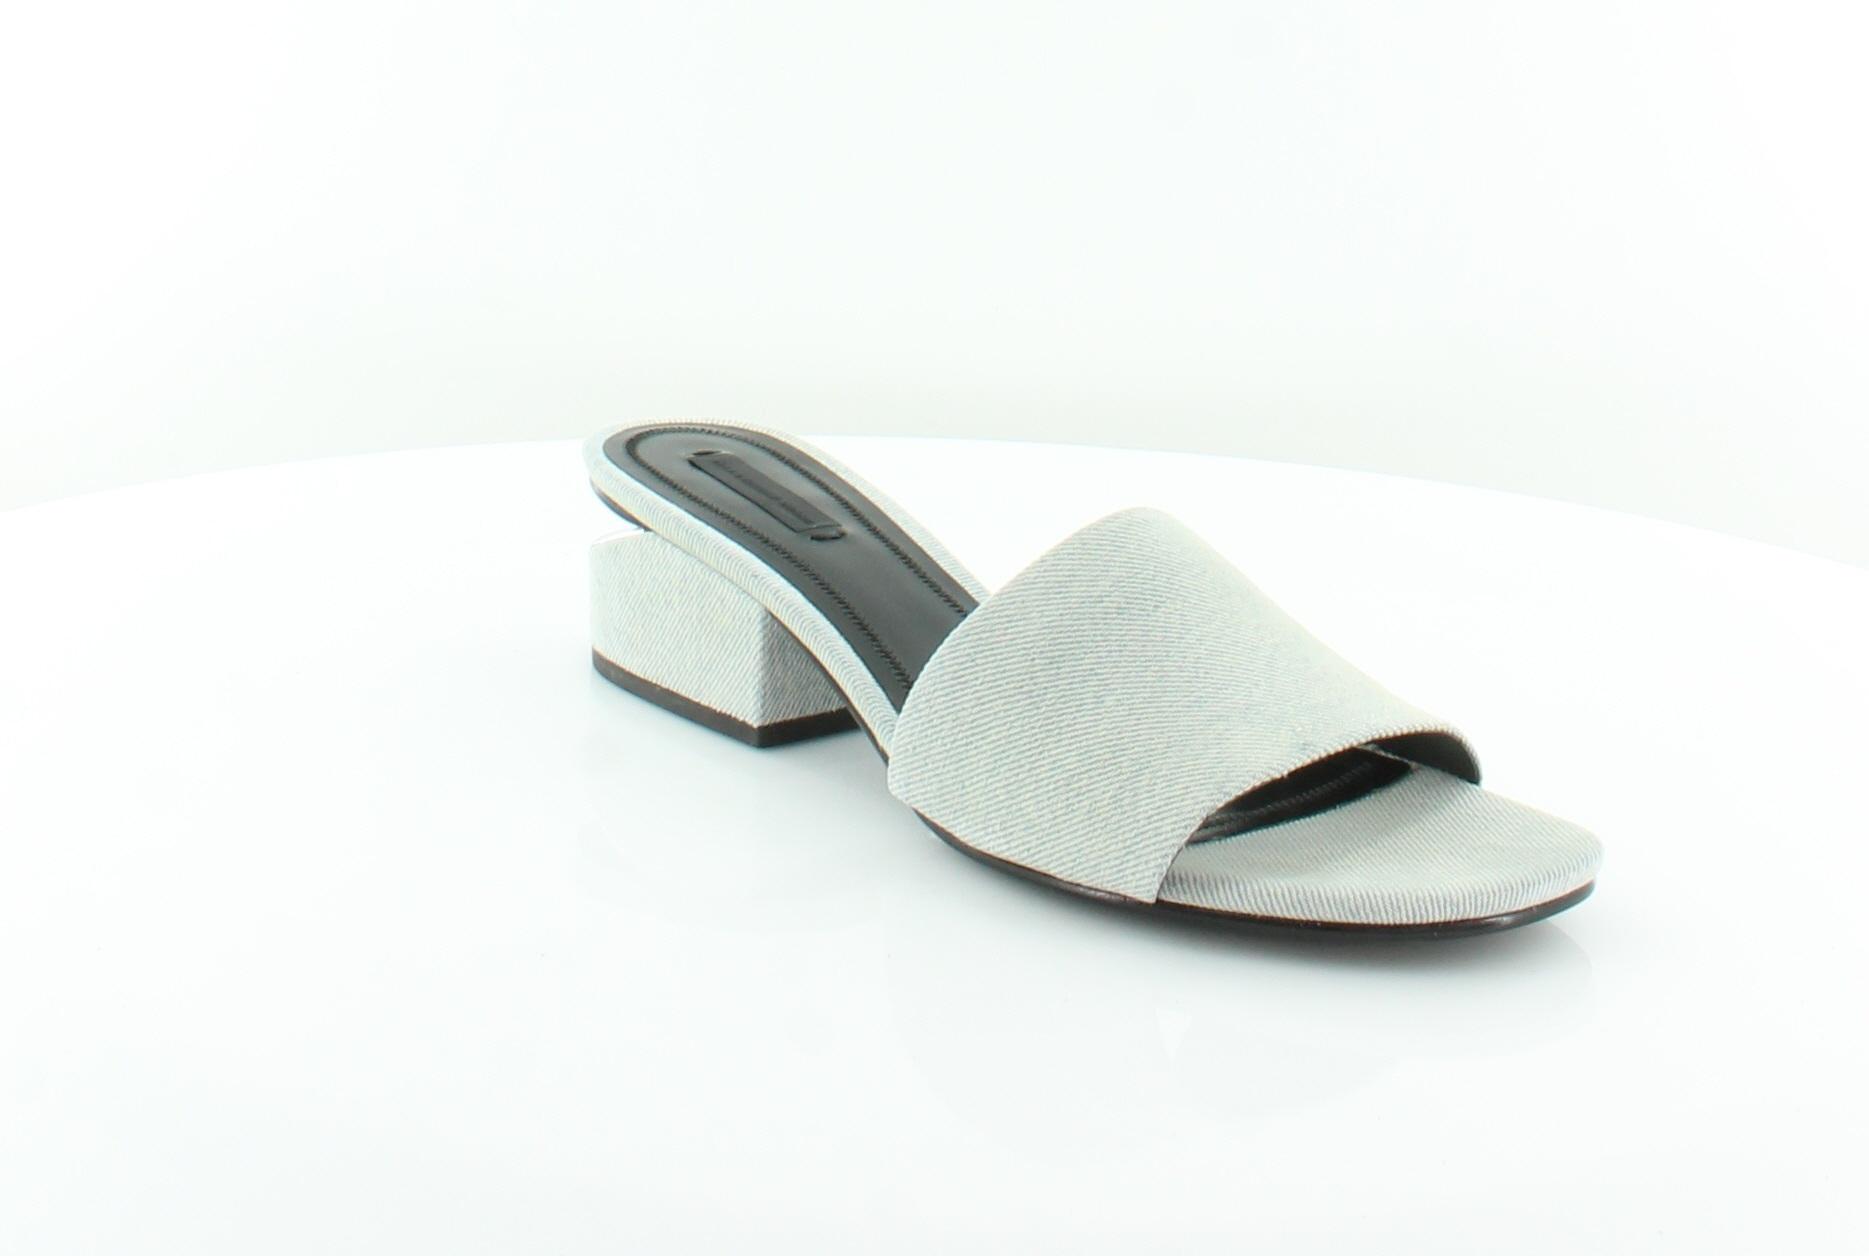 Alexander Wang Wang Wang Hollie blu donna scarpe Dimensione 10 M Sandals MSRP  425 d9d84c